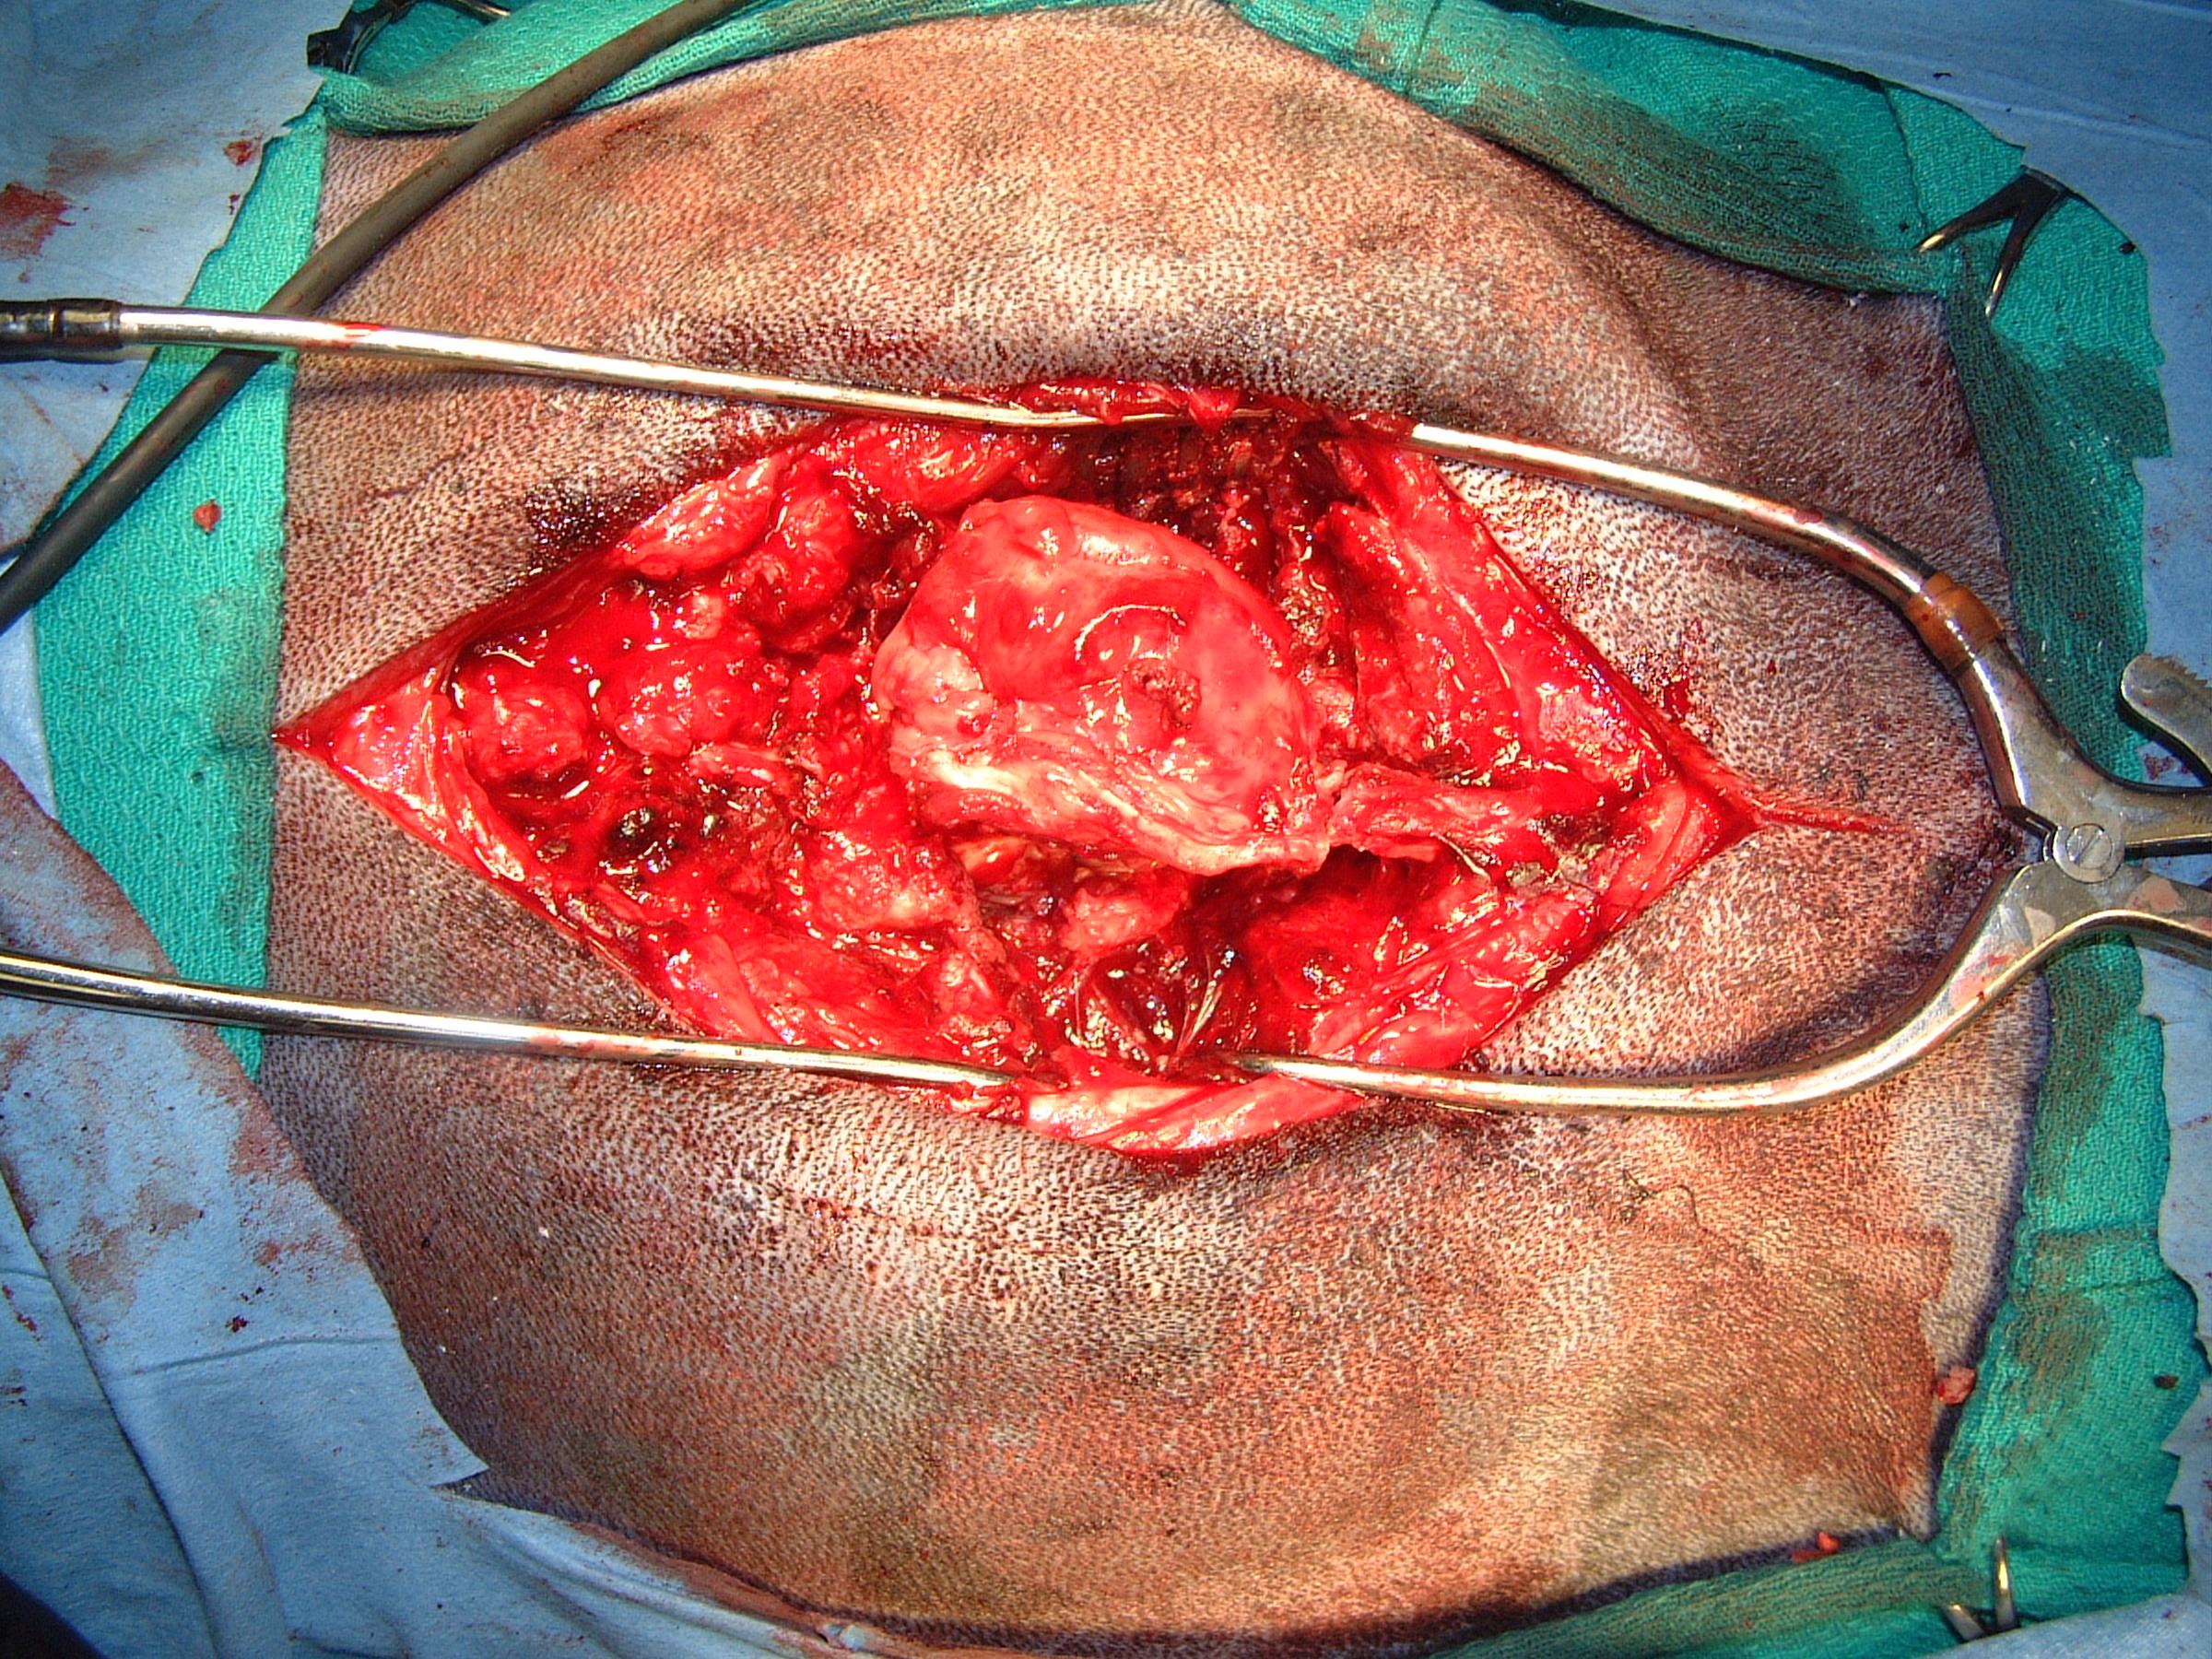 Thoracic Osteochondroma